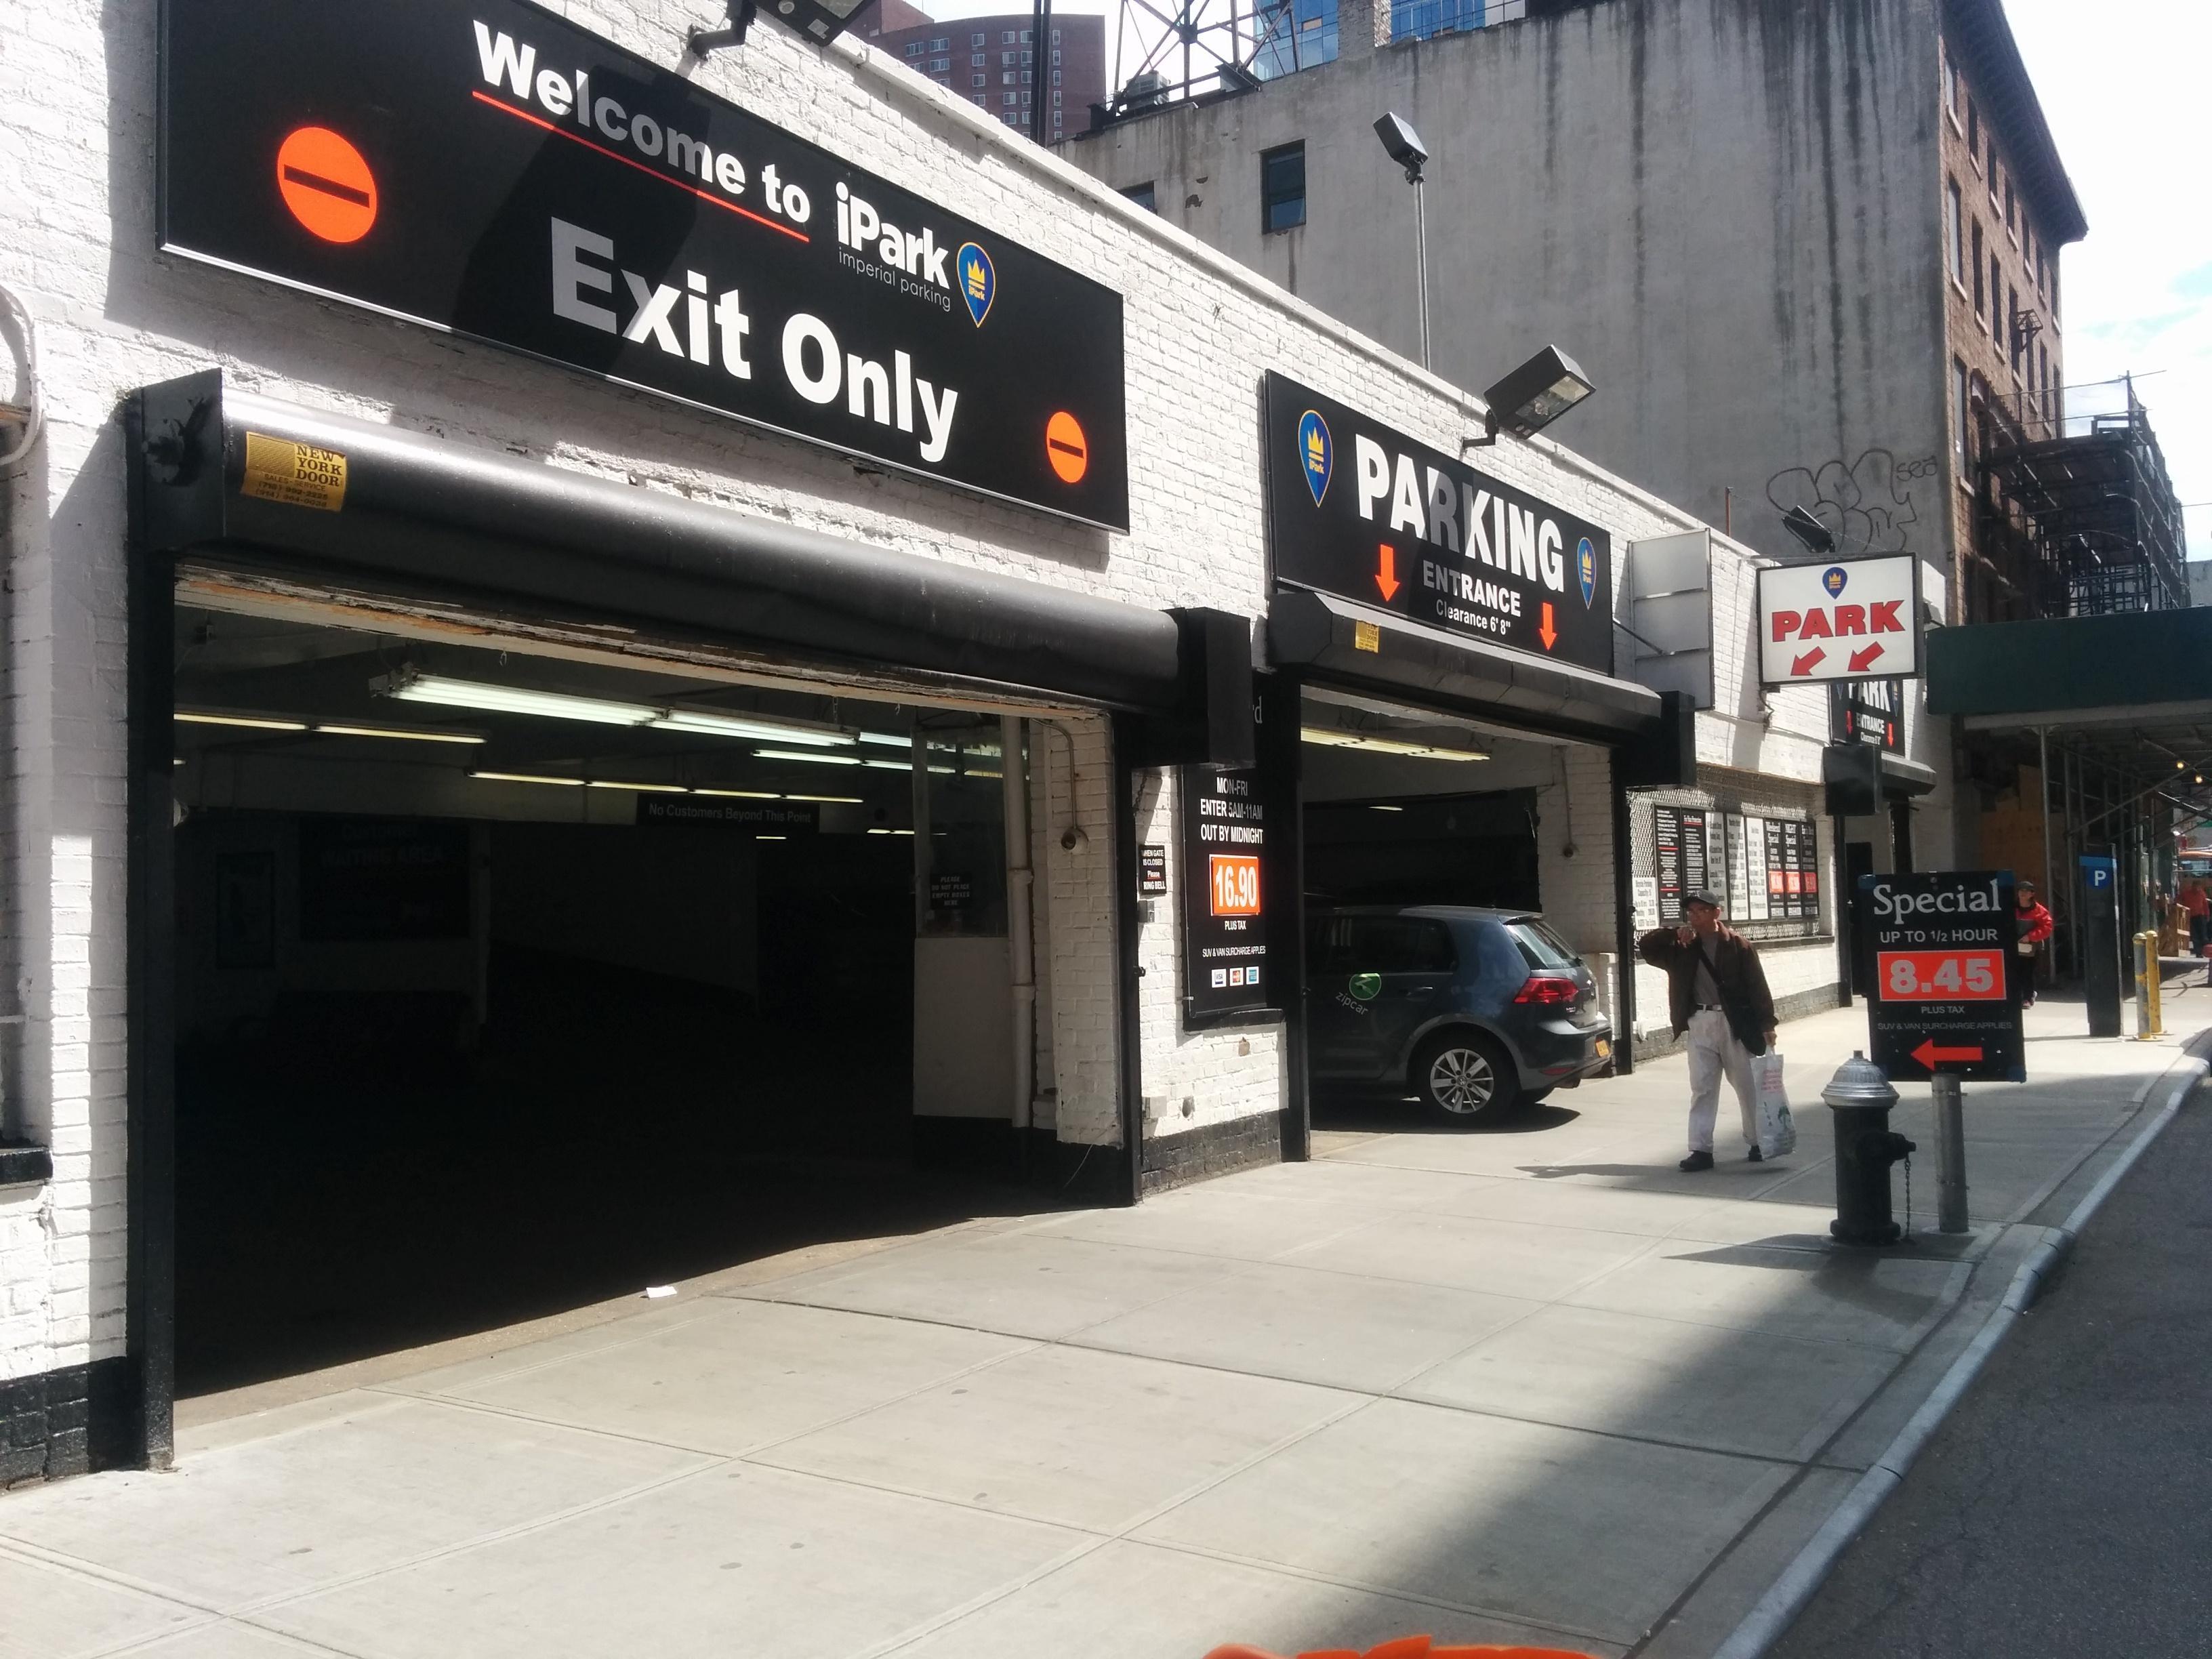 44 elizabeth st garage parking in new york parkme for New york parking garage